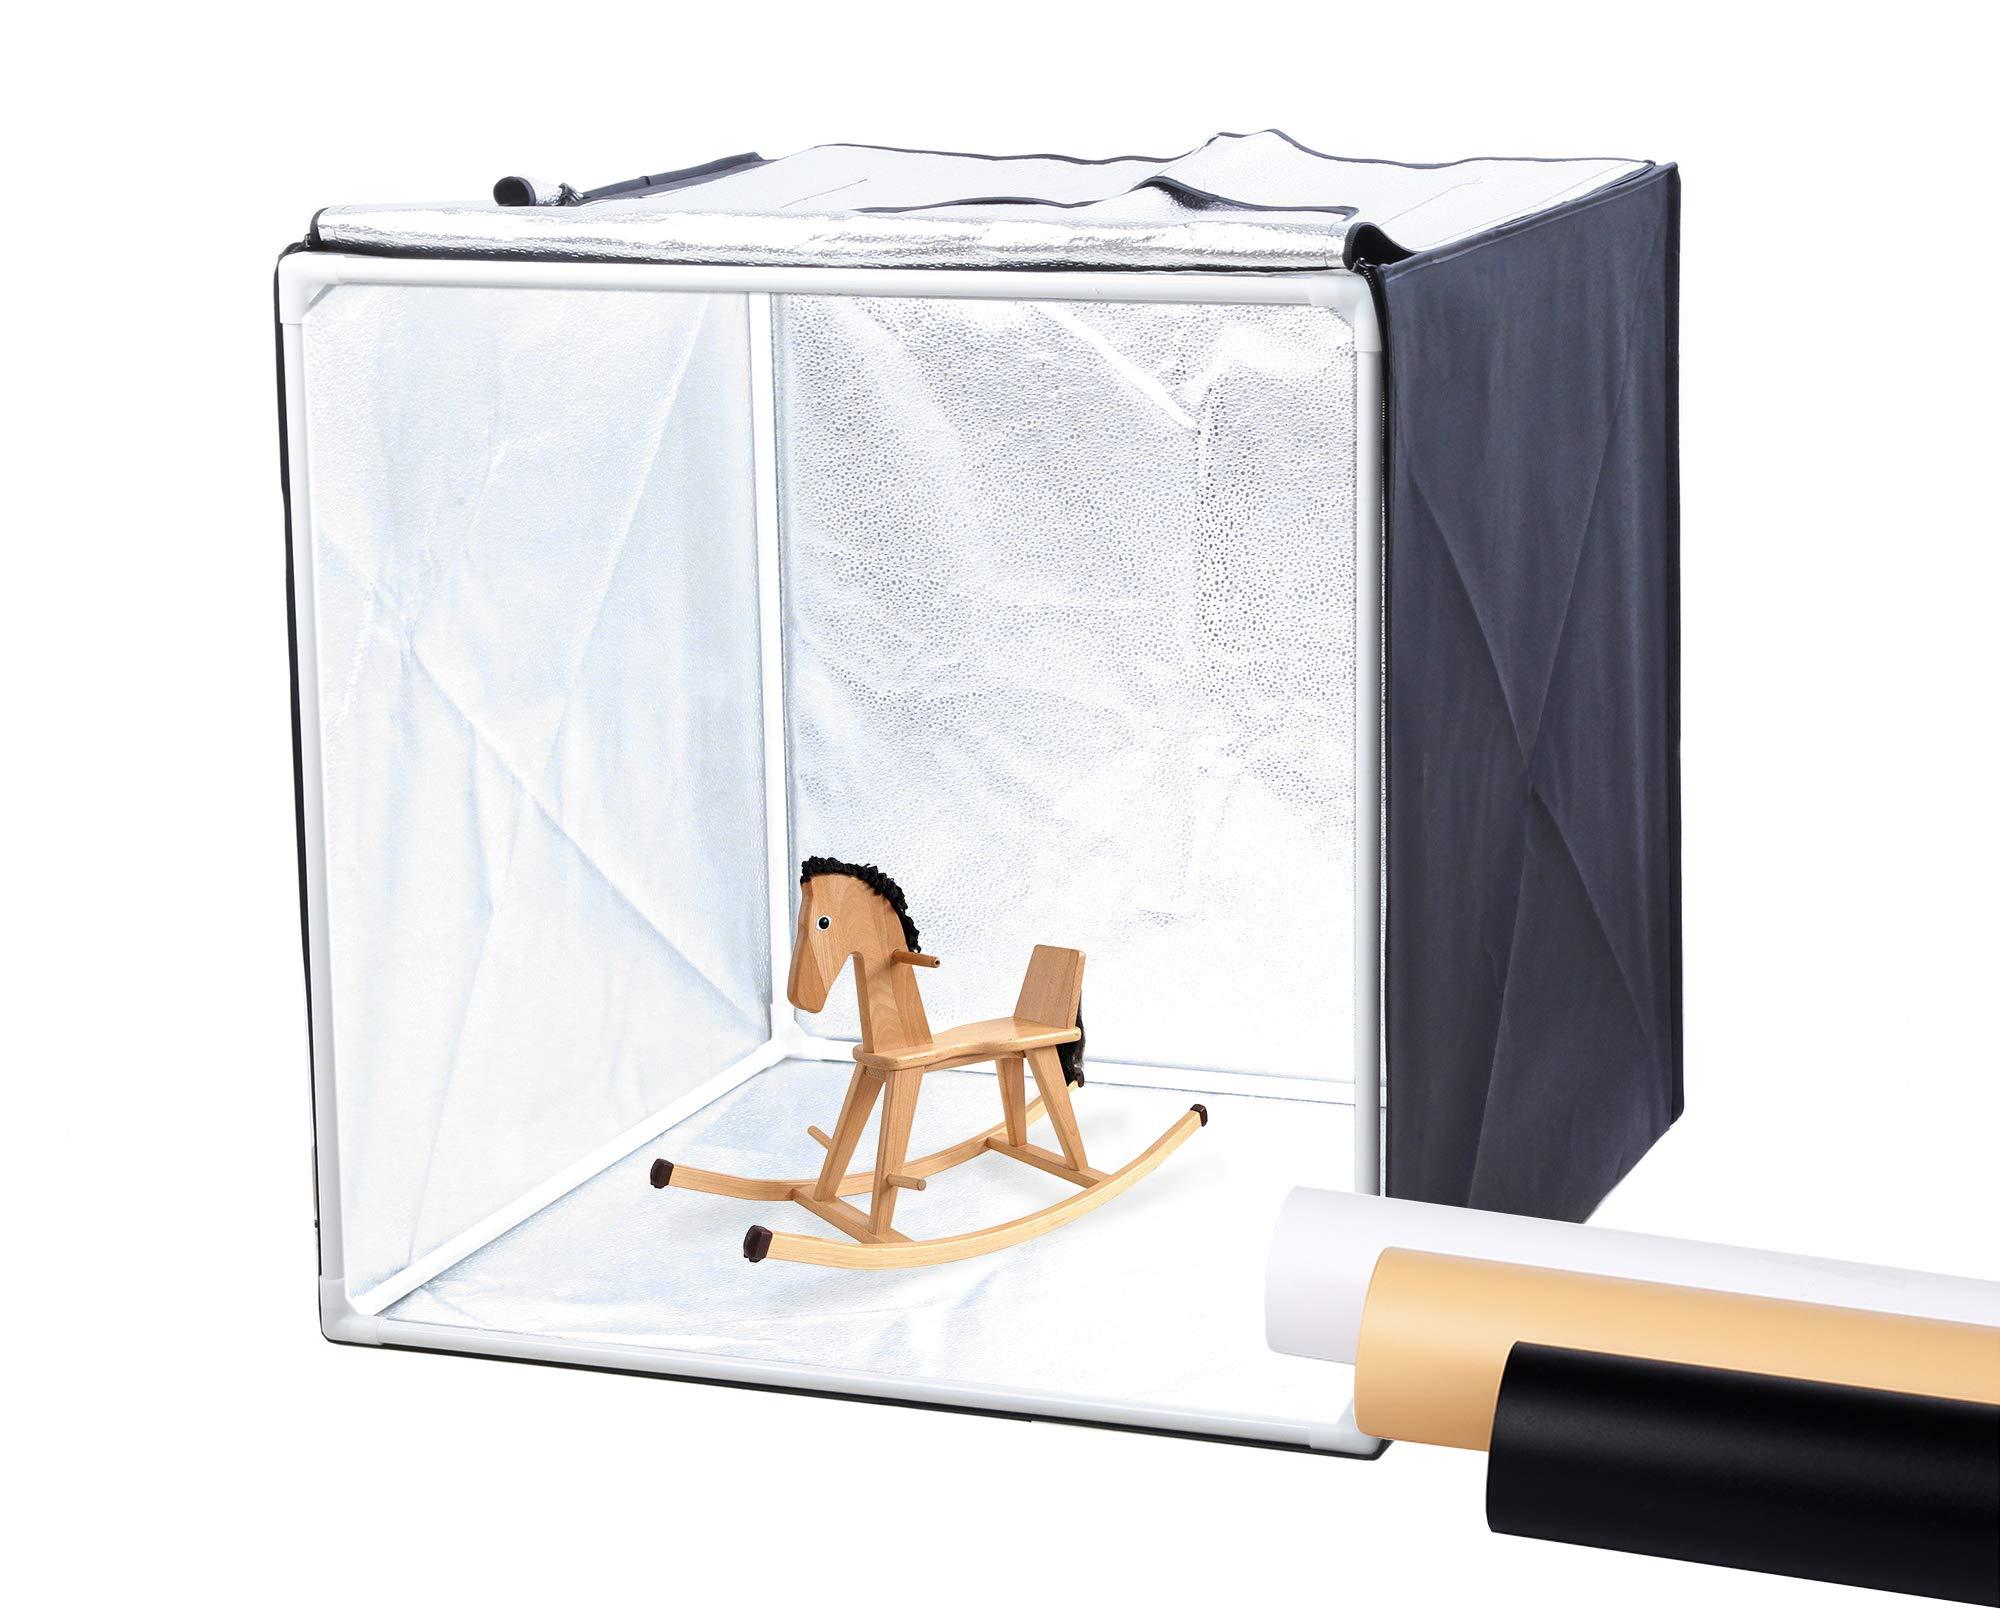 Finnhomy Professional Portable Photo Studio Photo Light Studio Photo Tent Light Box Table Top Photography Shooting Tent Box Lighting Kit, 24'' x 24'' Cube by Finnhomy